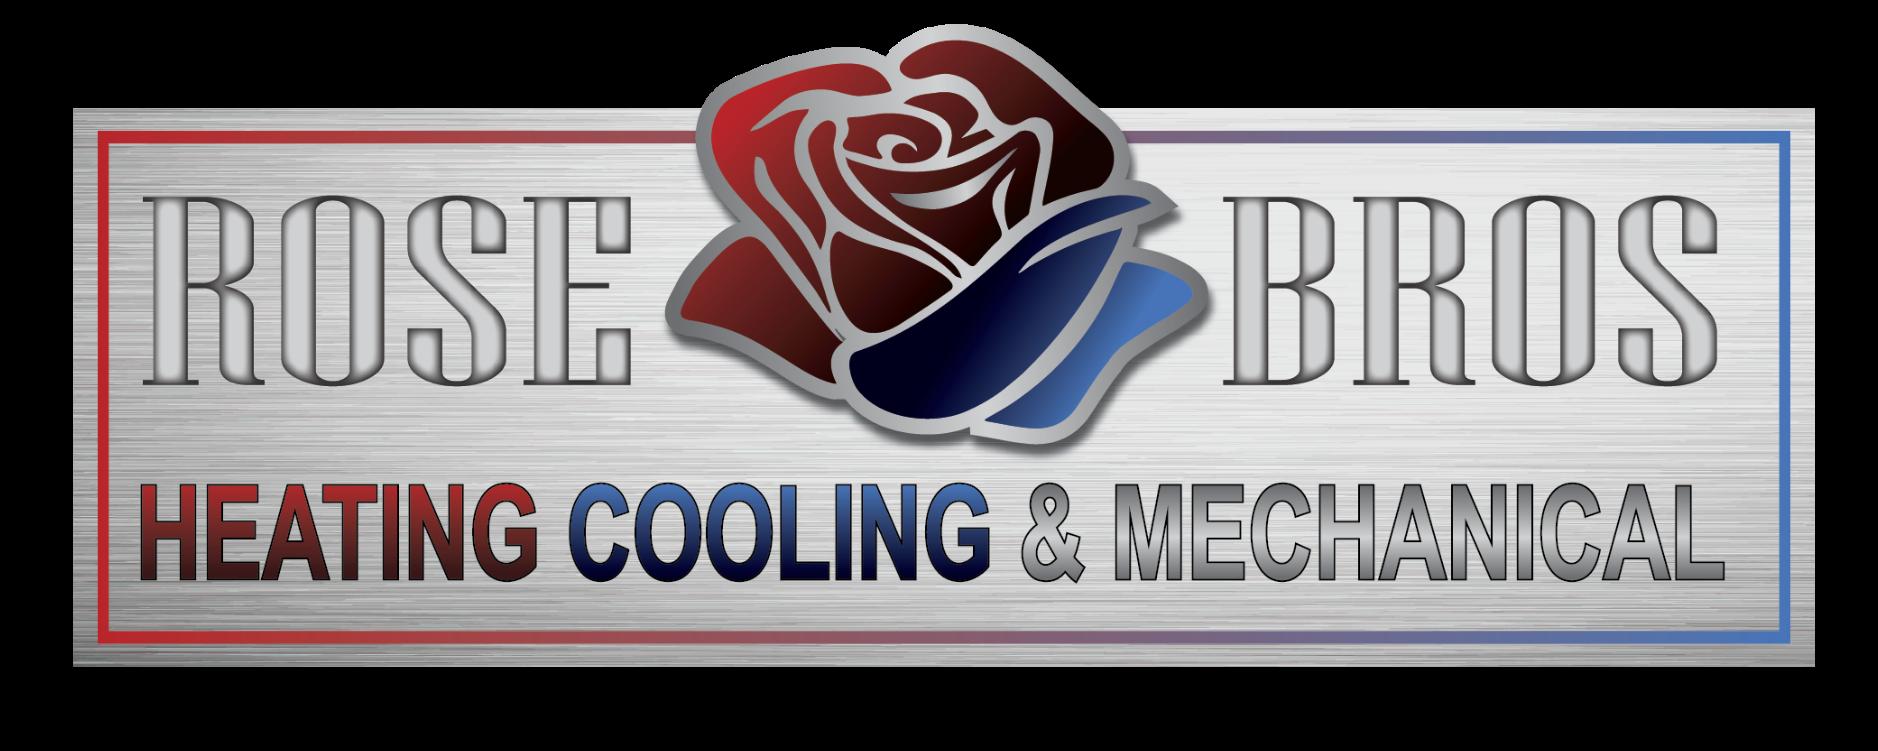 Rose Bros Heating, Cooling & Mechanical, Inc.